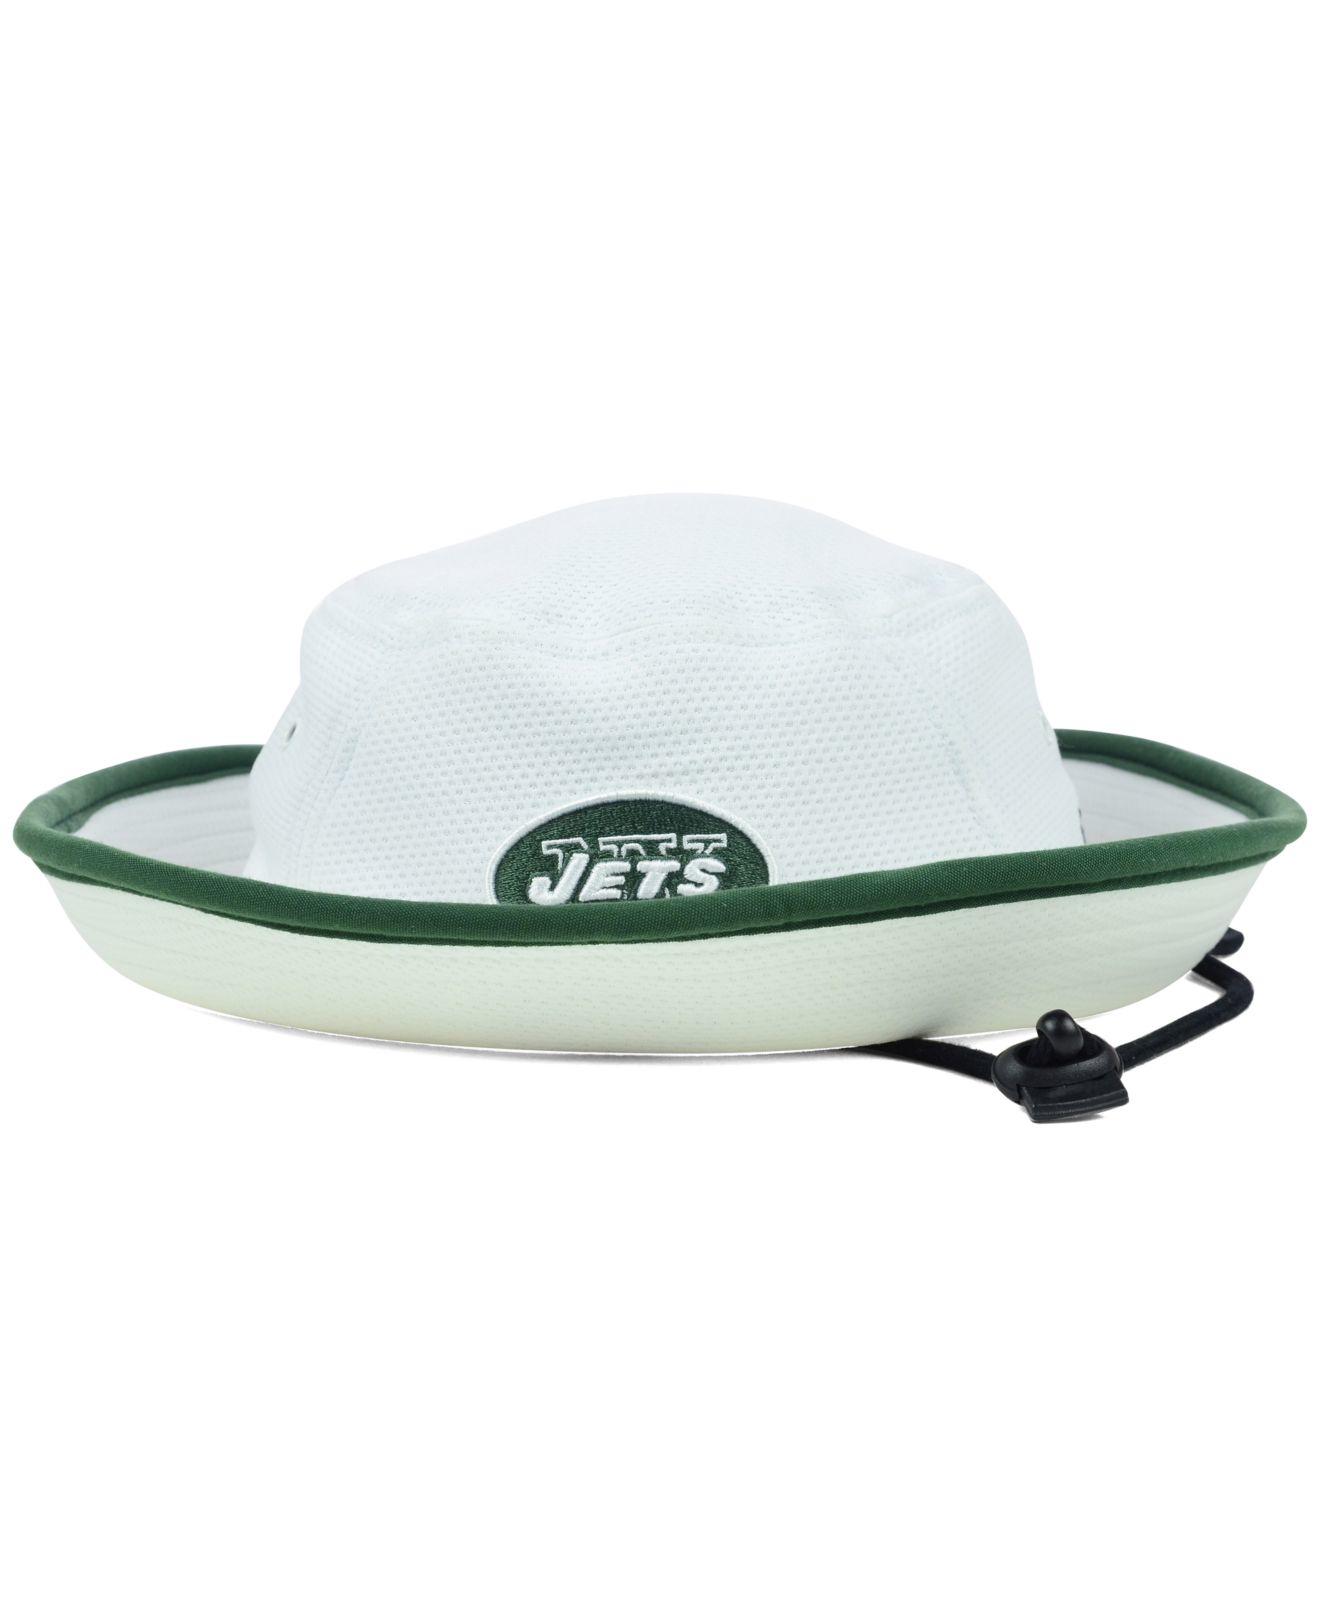 Ktz New York Jets Training Camp Bucket Hat in White for Men | Lyst